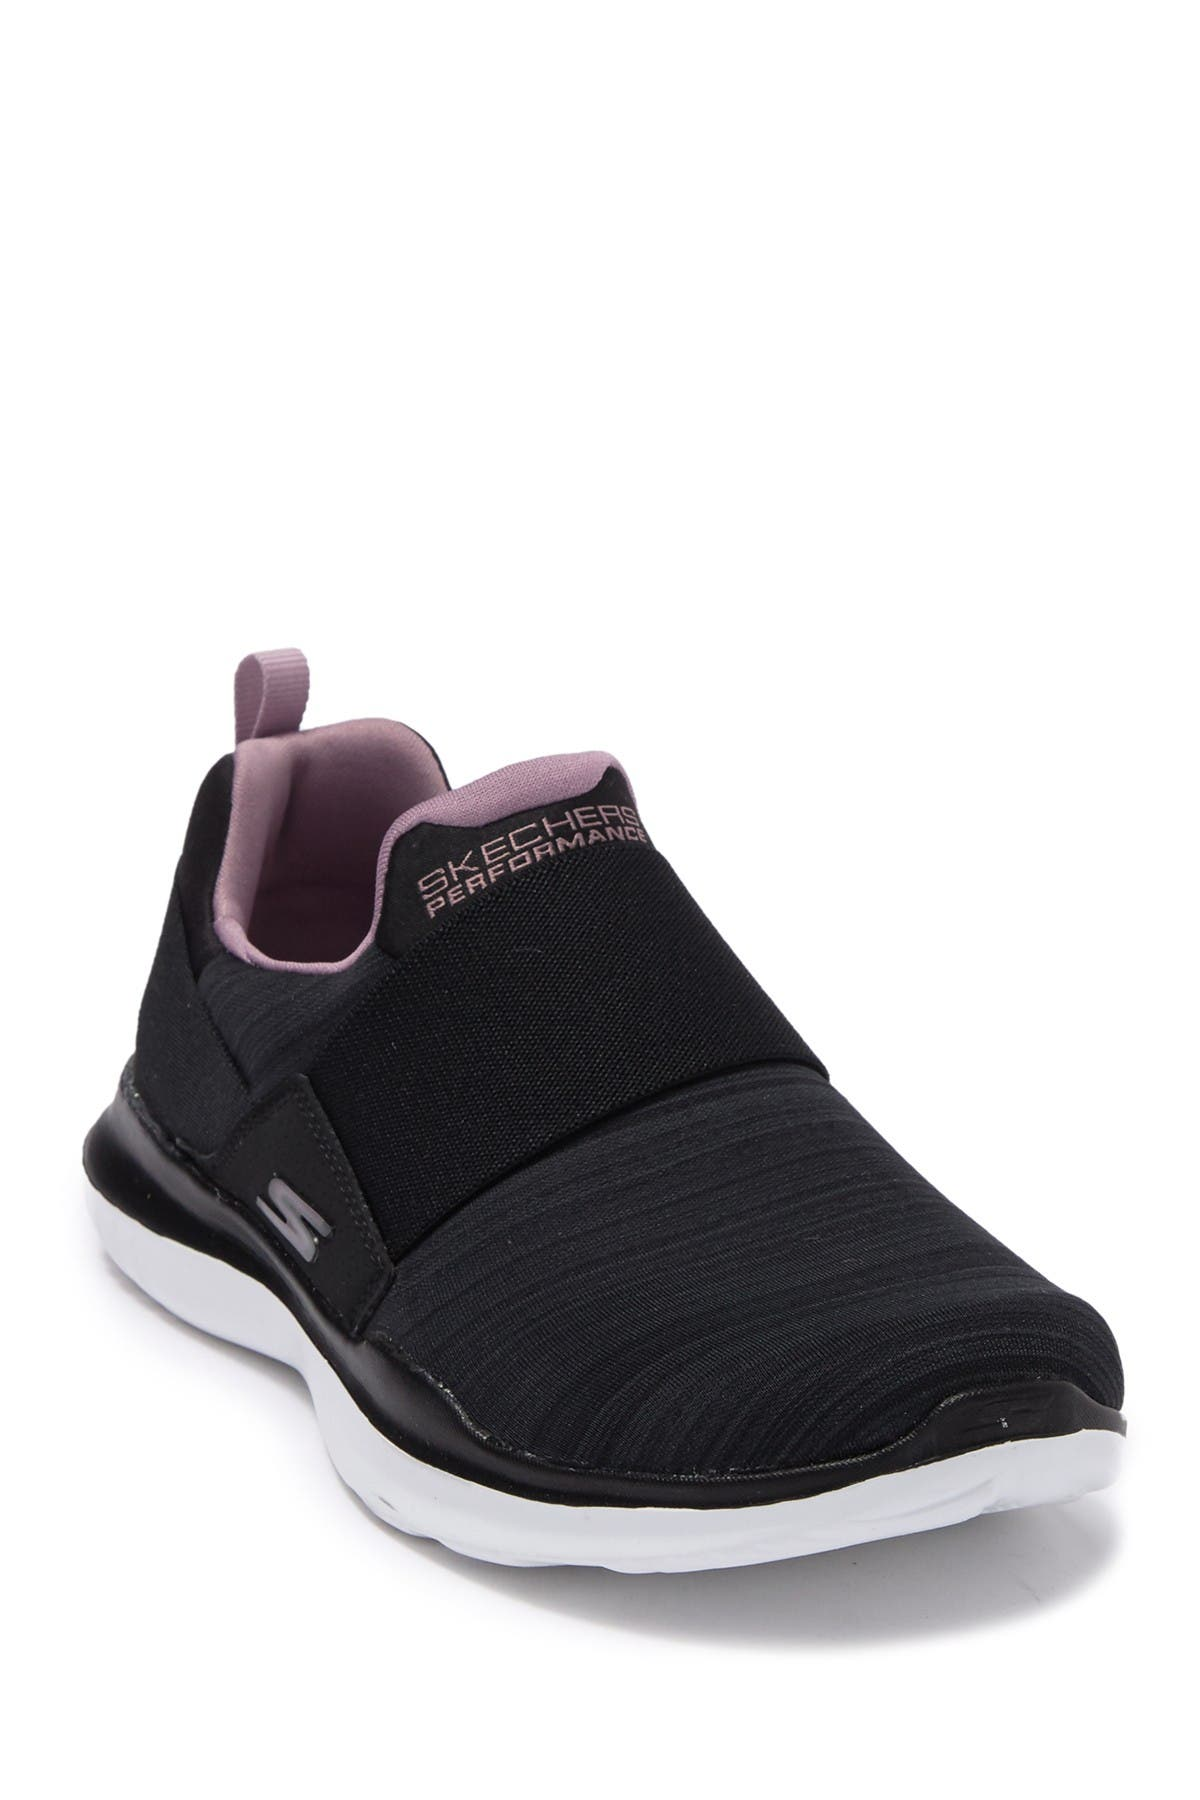 Skechers | Go Run Mojo Ensure Sneaker